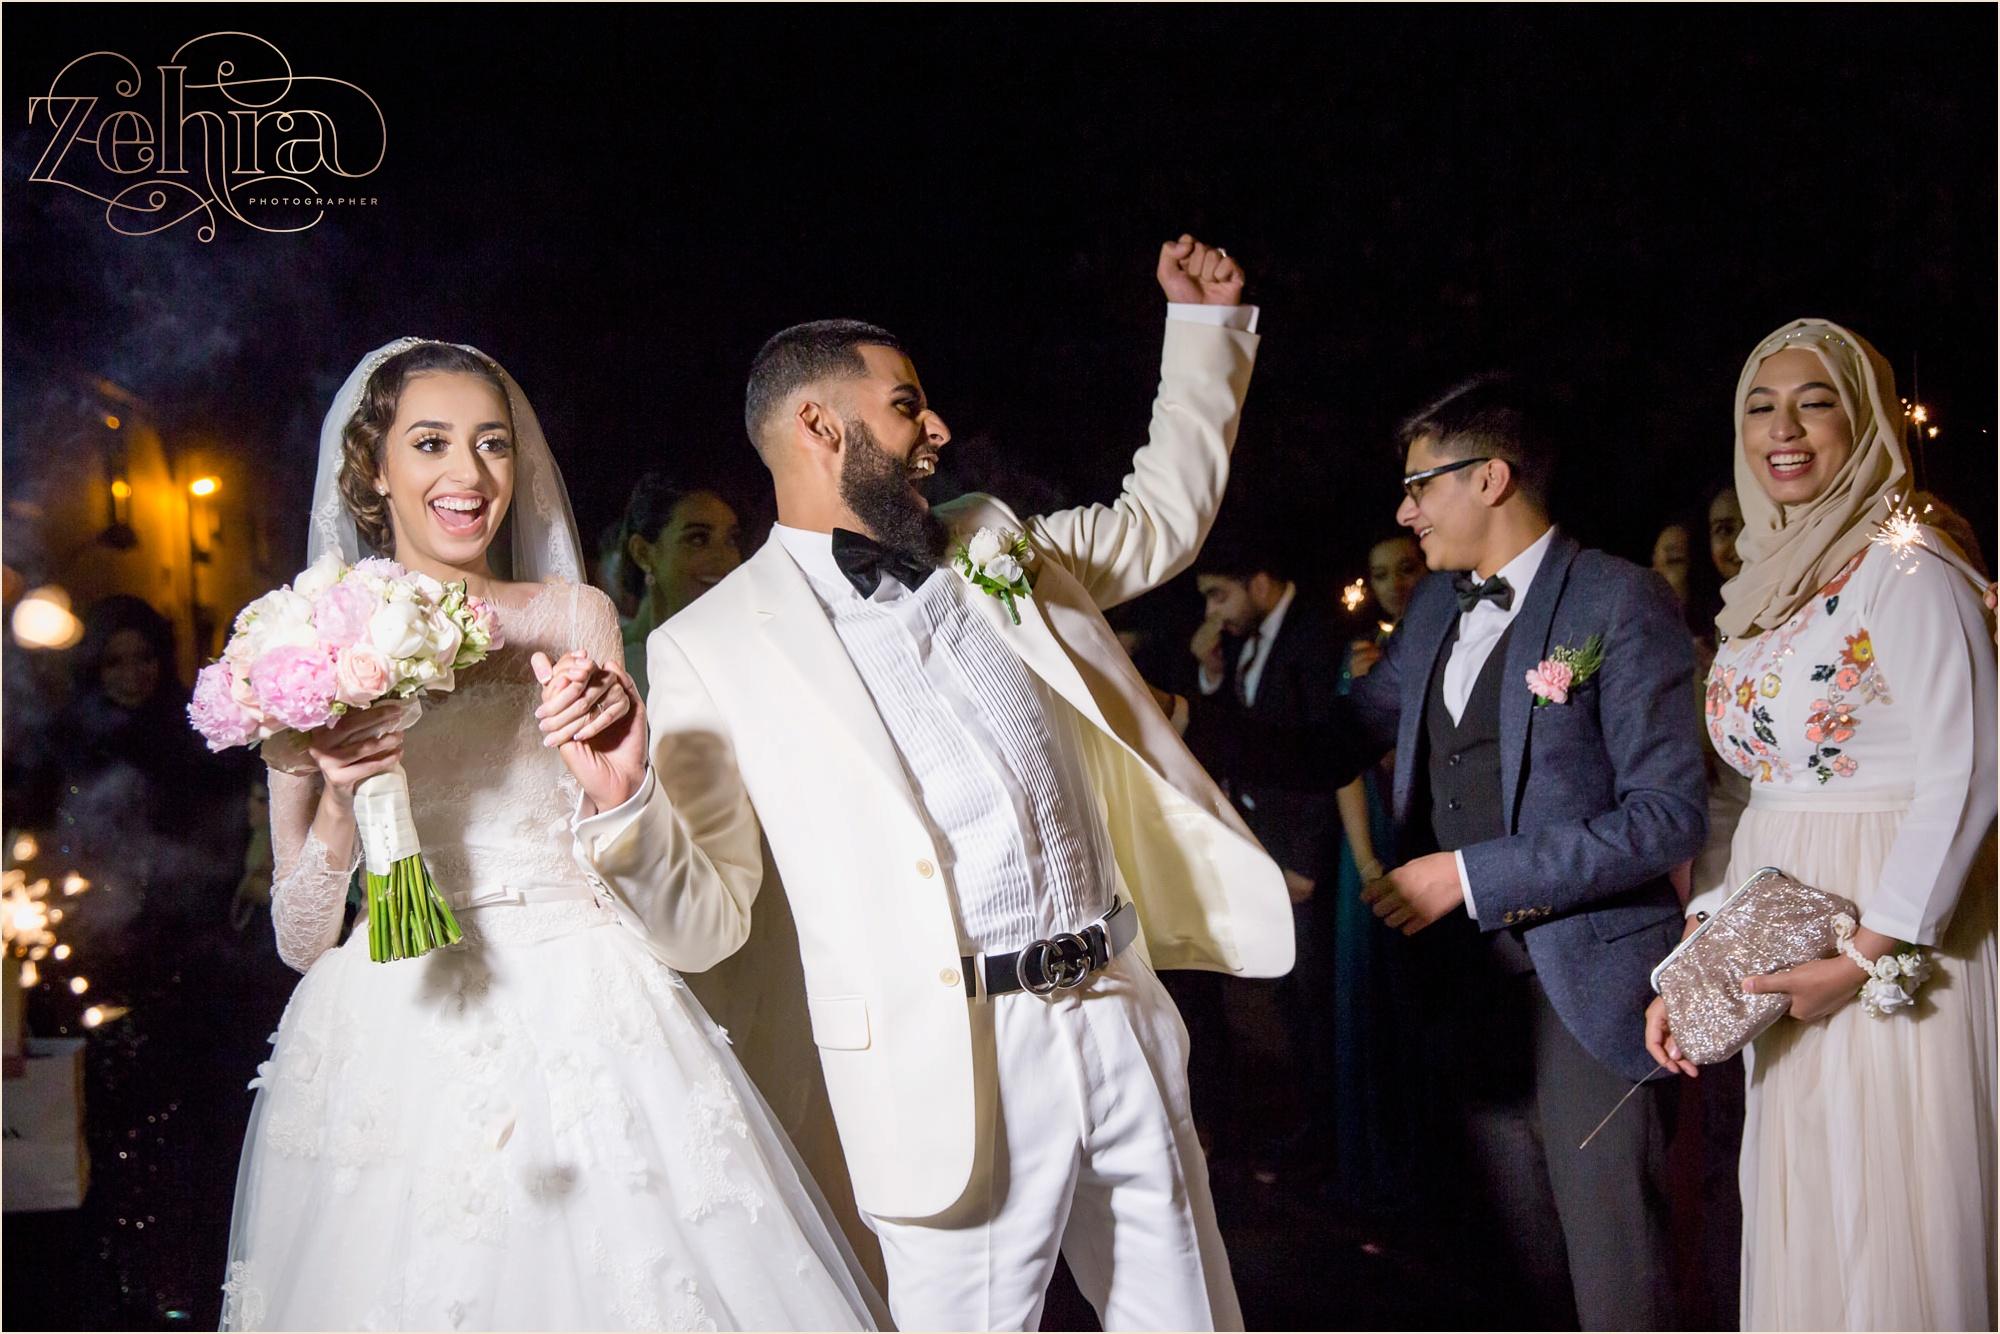 jasira manchester wedding photographer_0045.jpg